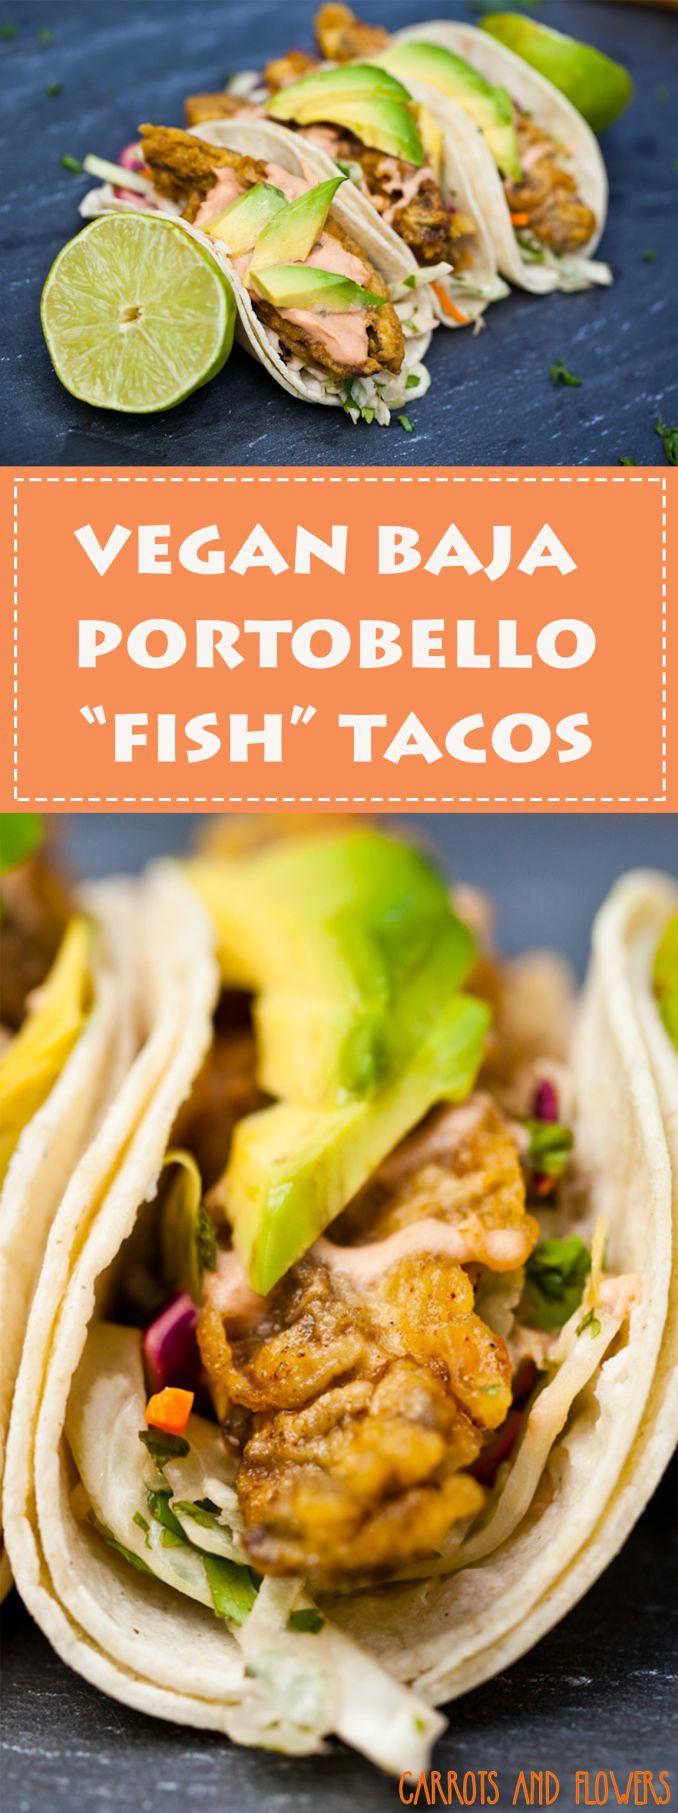 17 best ideas about vegan tacos on pinterest veggie for Vegan fish tacos